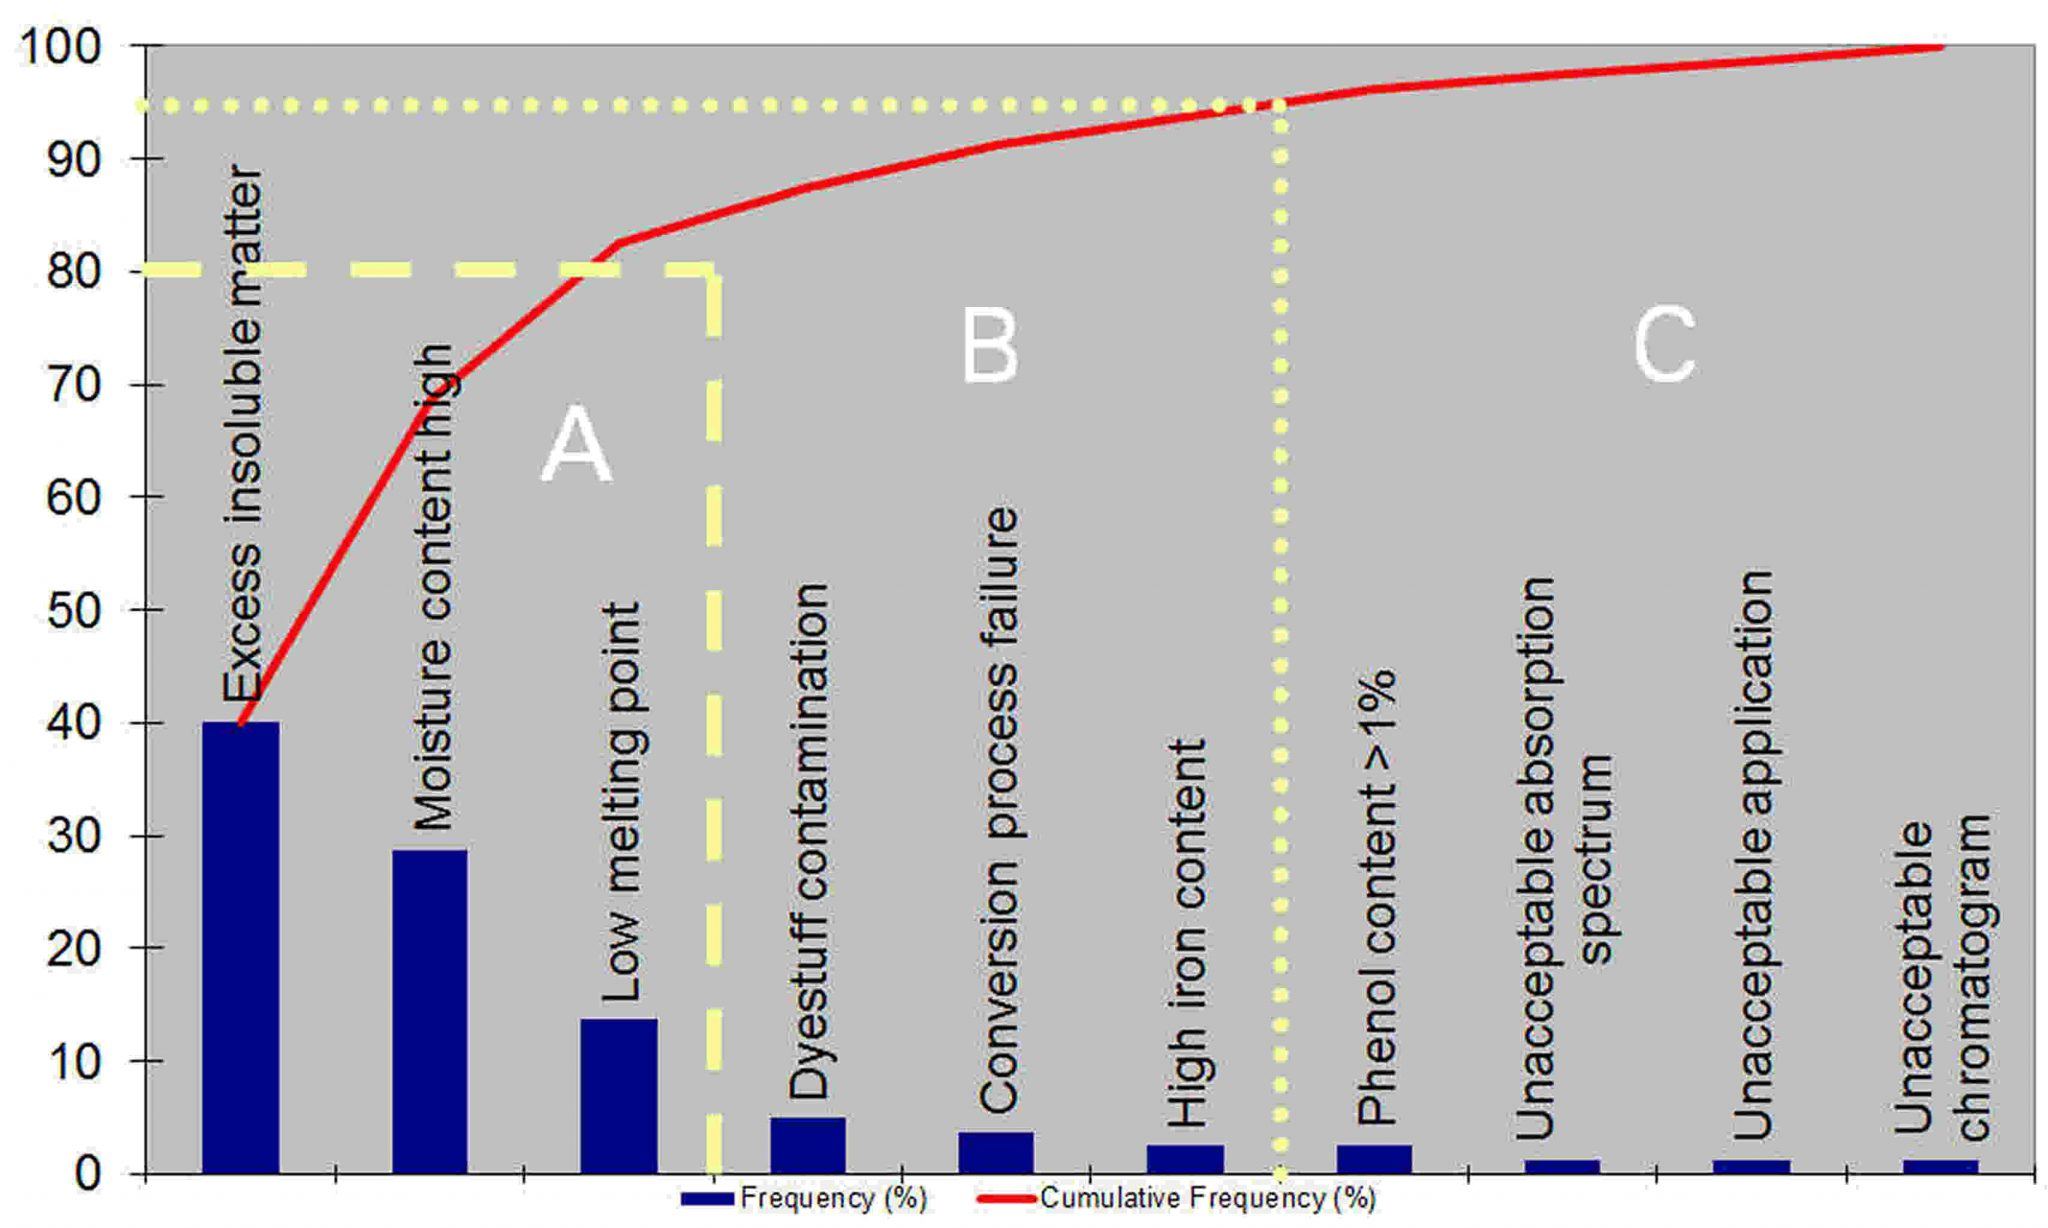 Pareto chart example